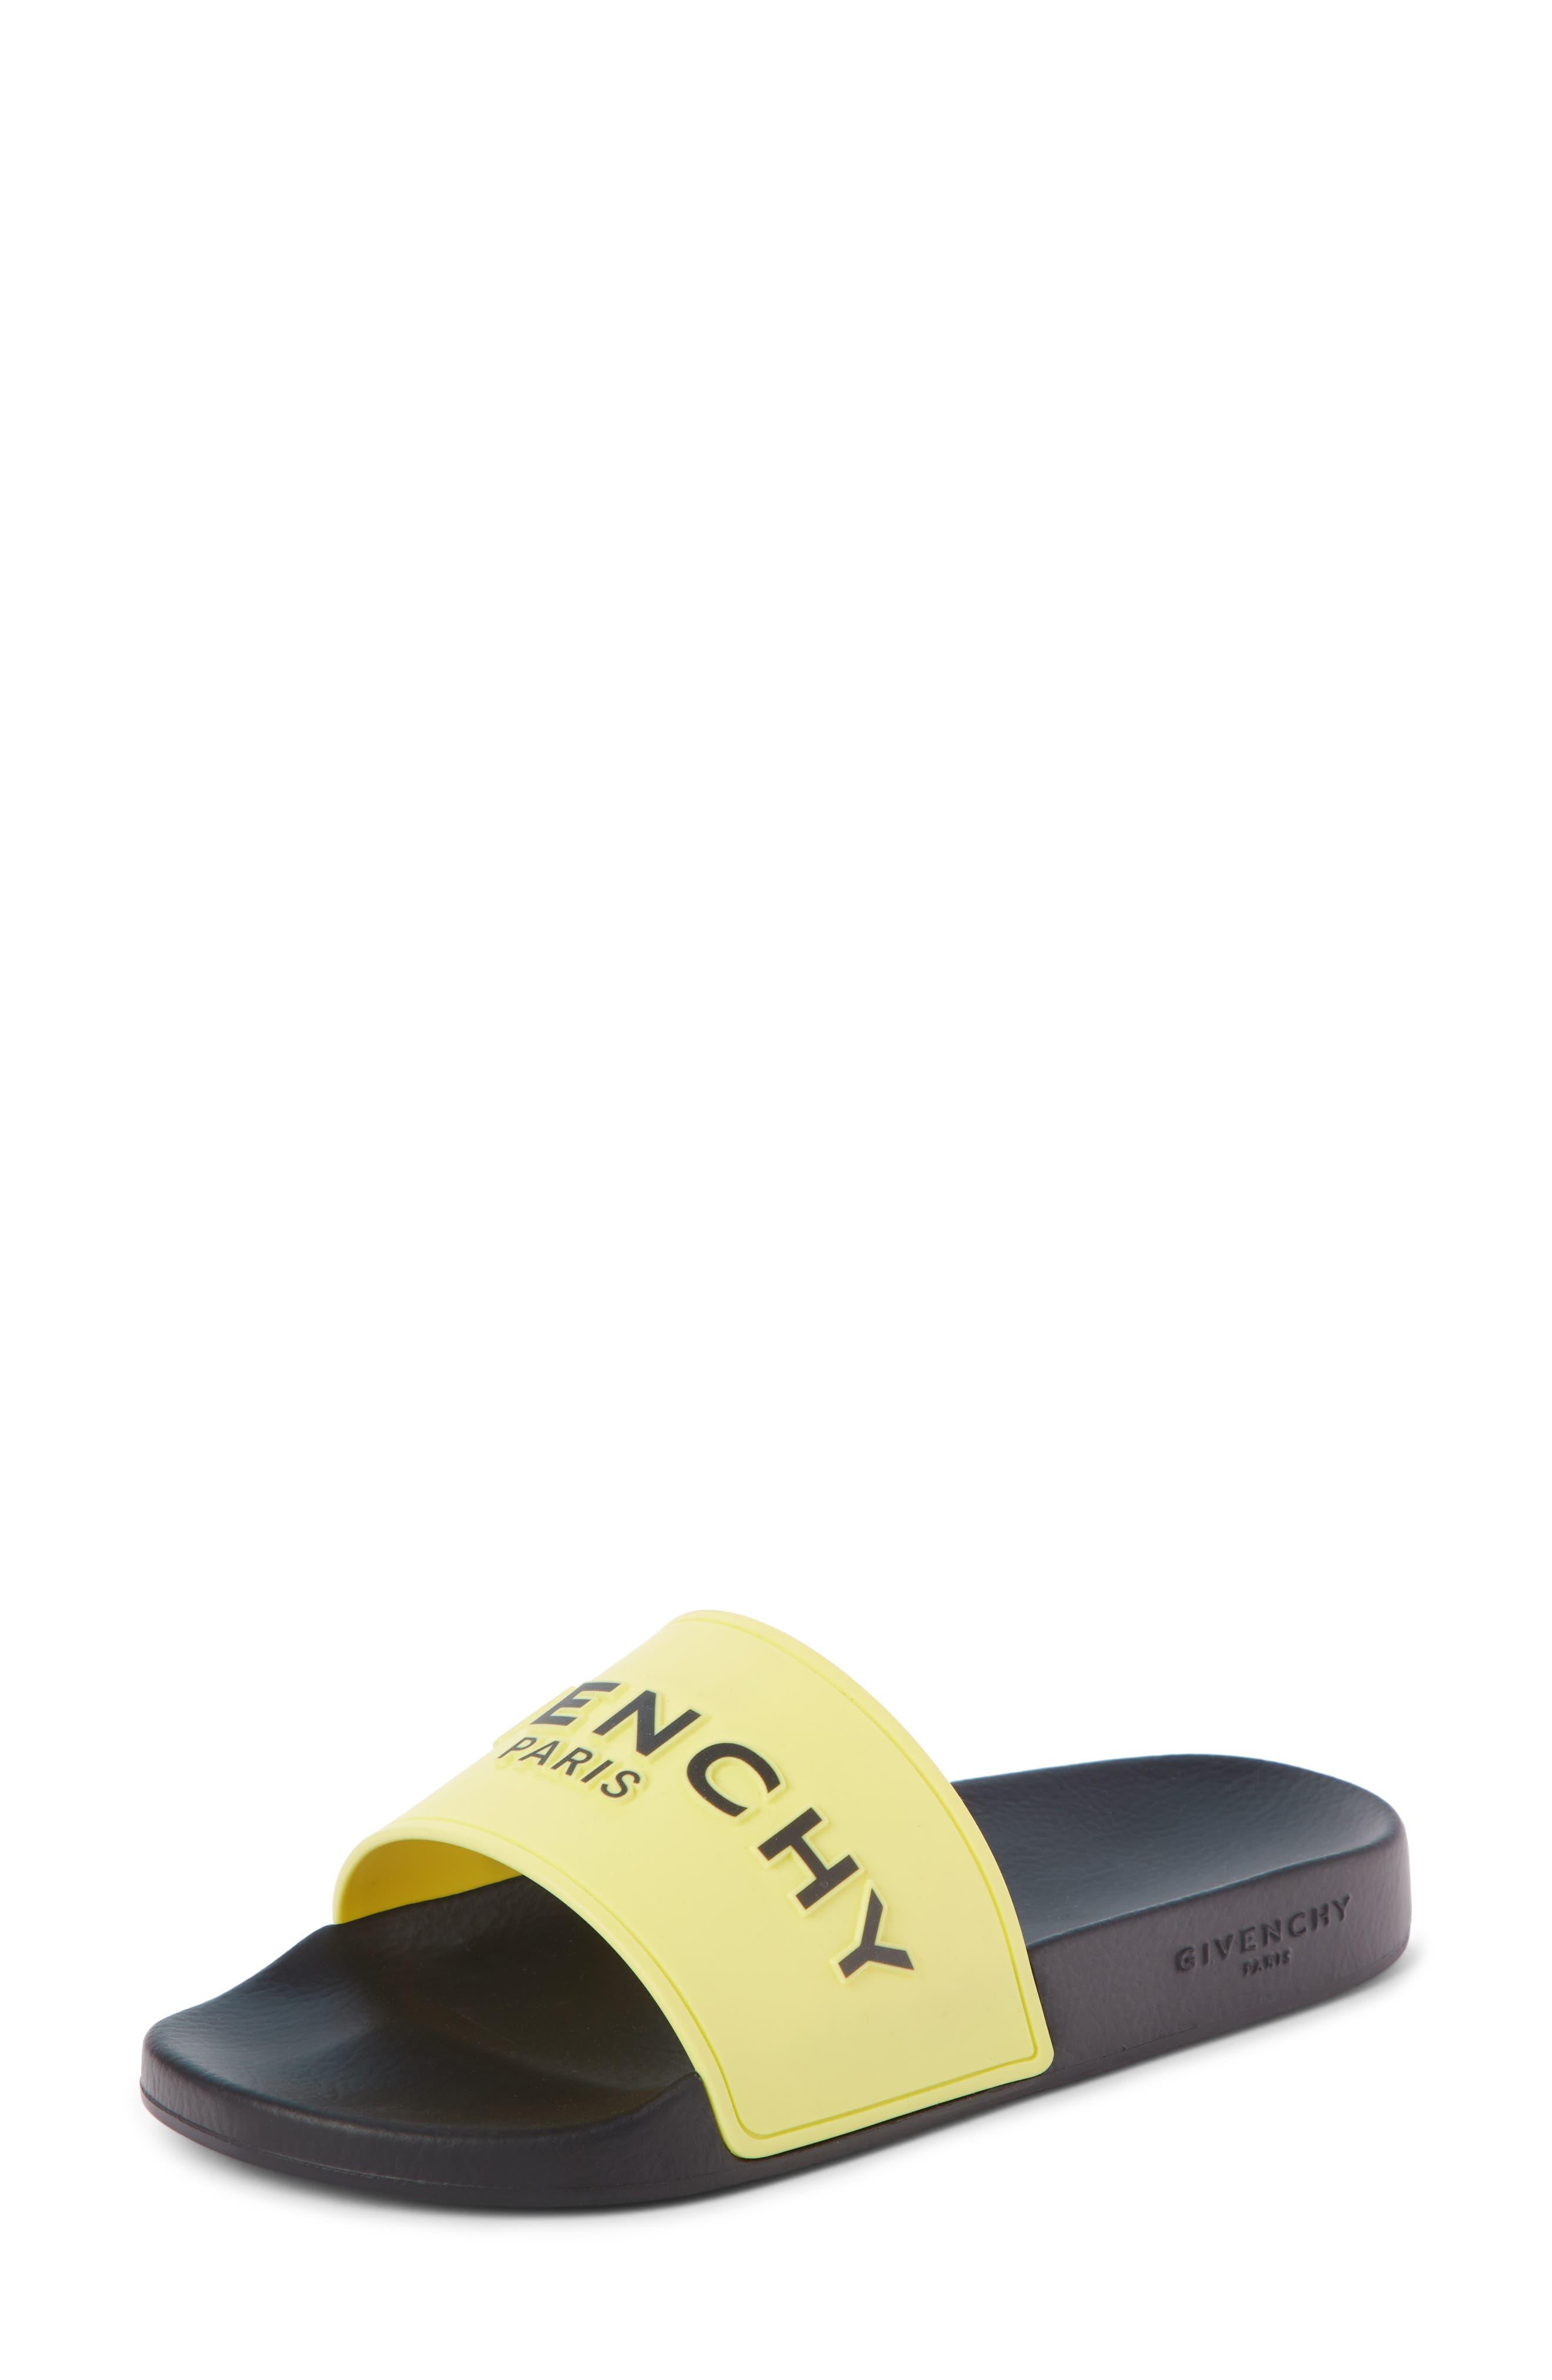 Givenchy Logo Slide, Yellow